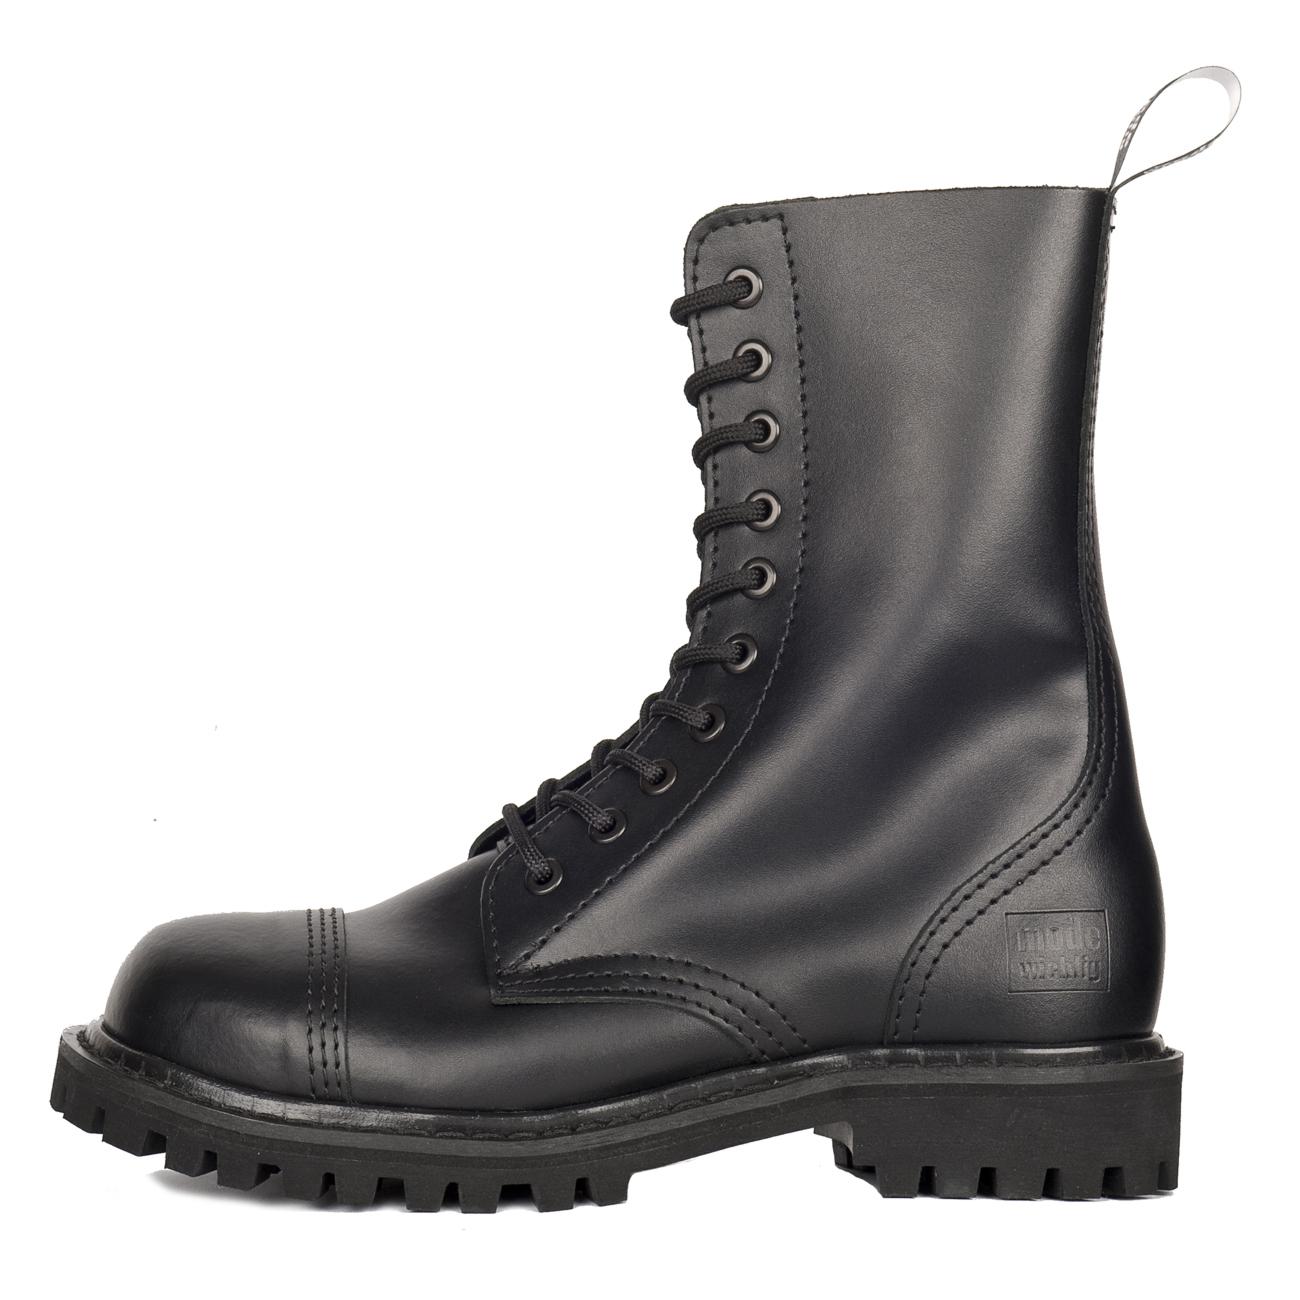 10 loch mw steel boots mit stahlkappe schuhe mode wichtig. Black Bedroom Furniture Sets. Home Design Ideas